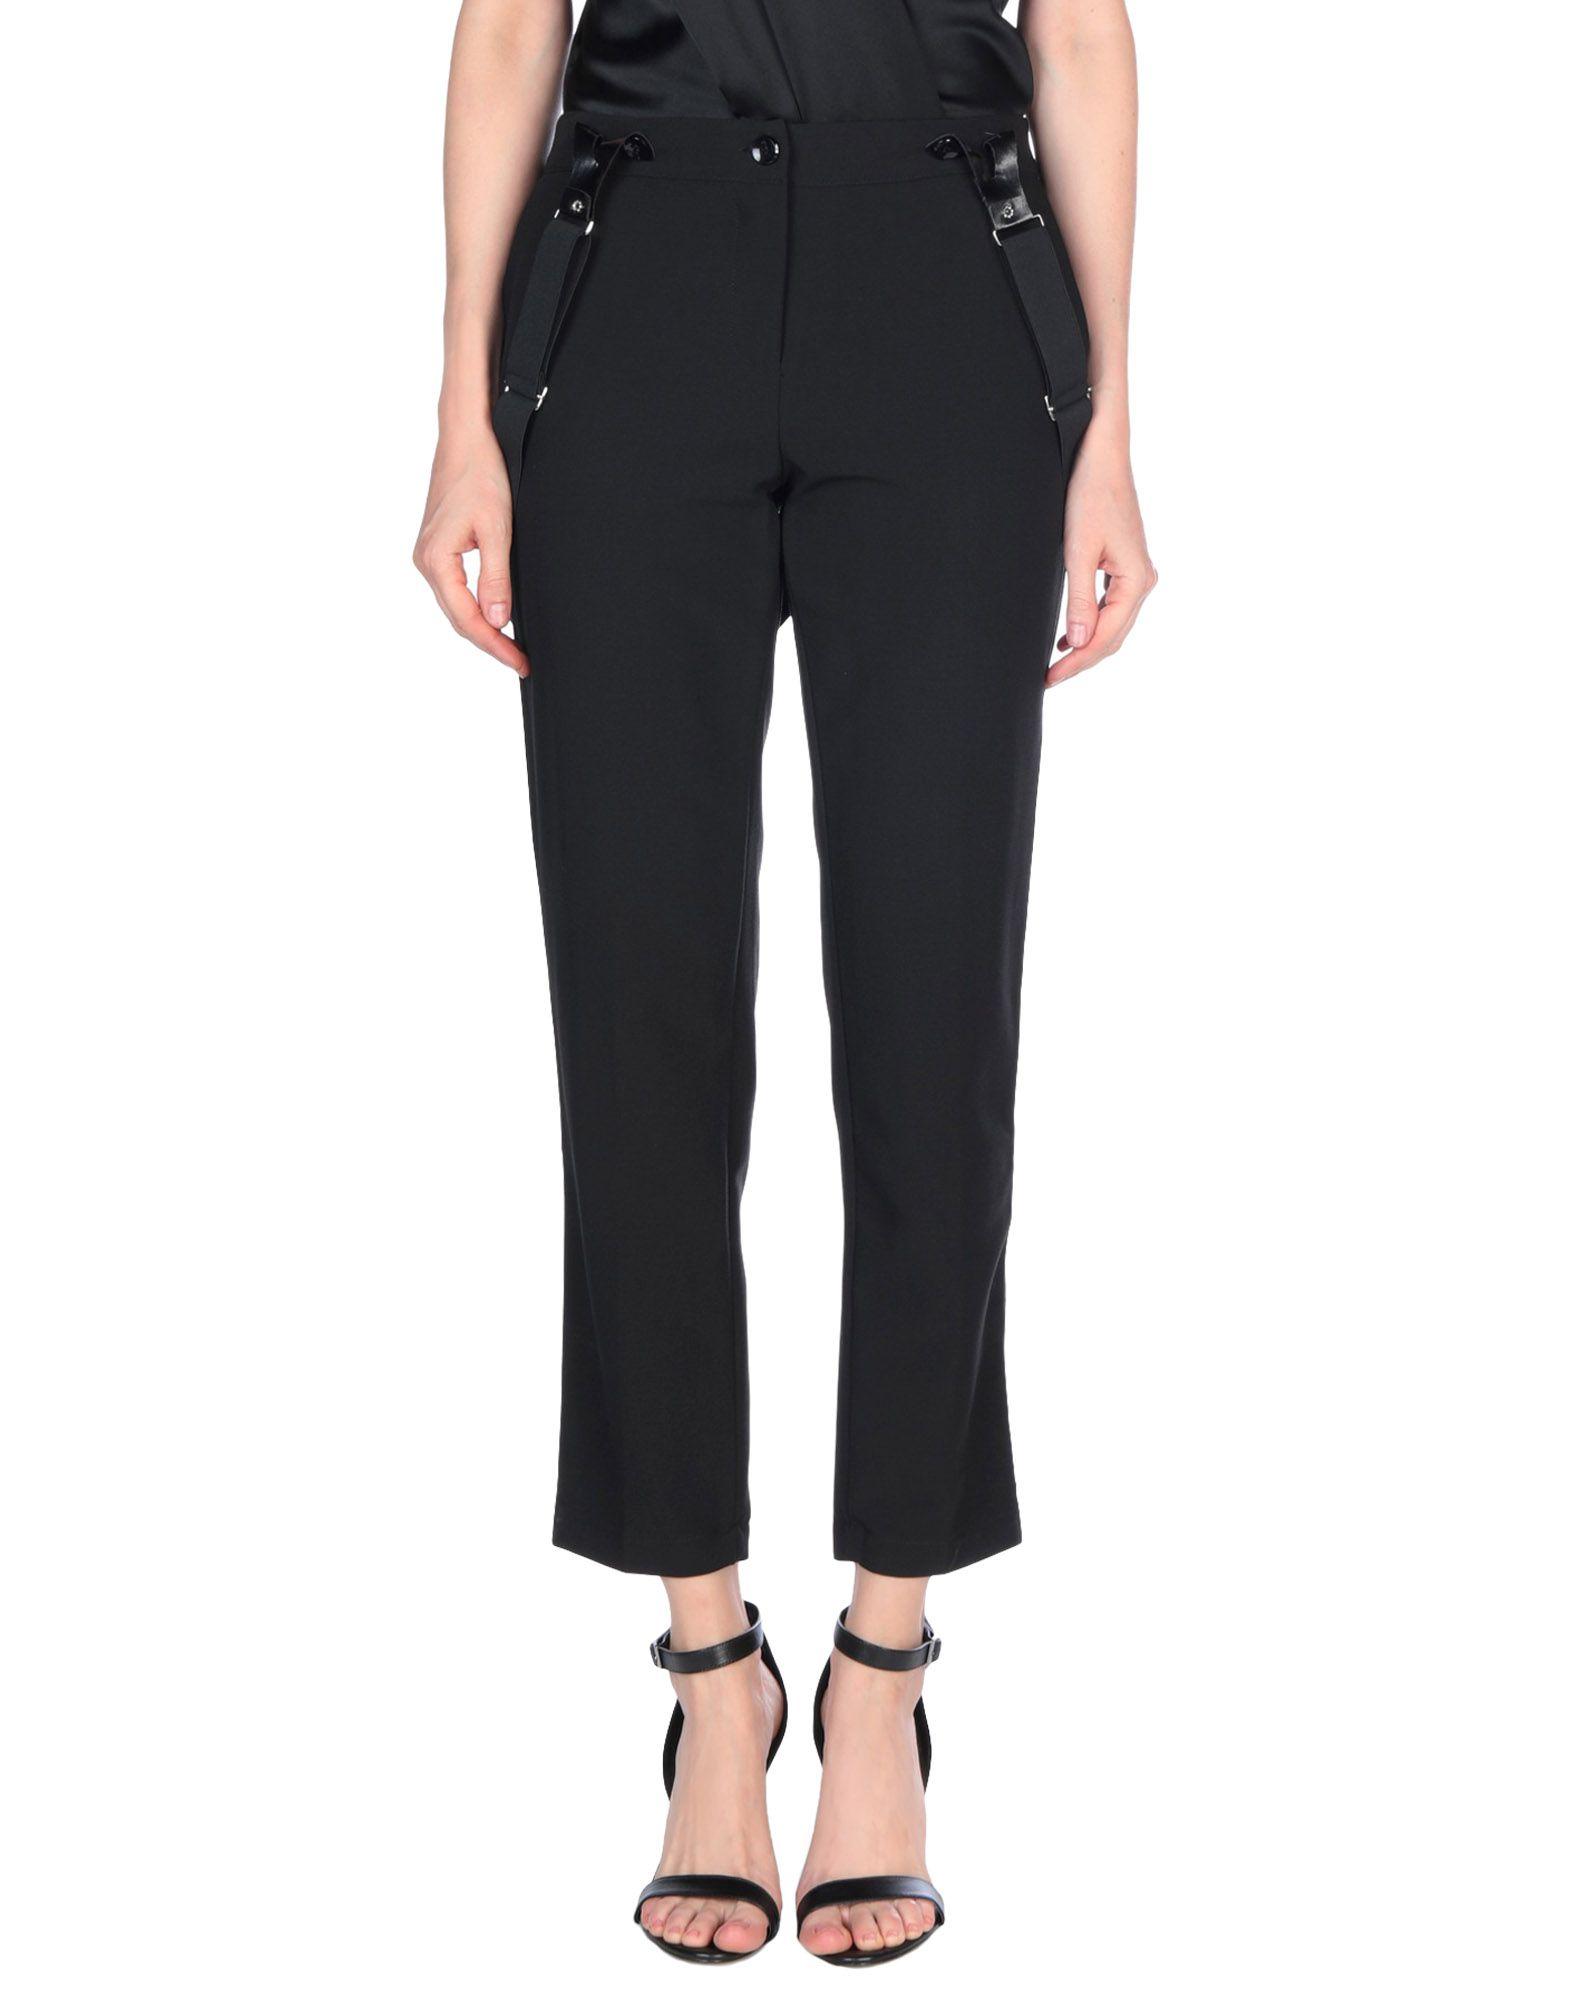 pantalon avec bretelle femme jusqu 80 pureshopping. Black Bedroom Furniture Sets. Home Design Ideas